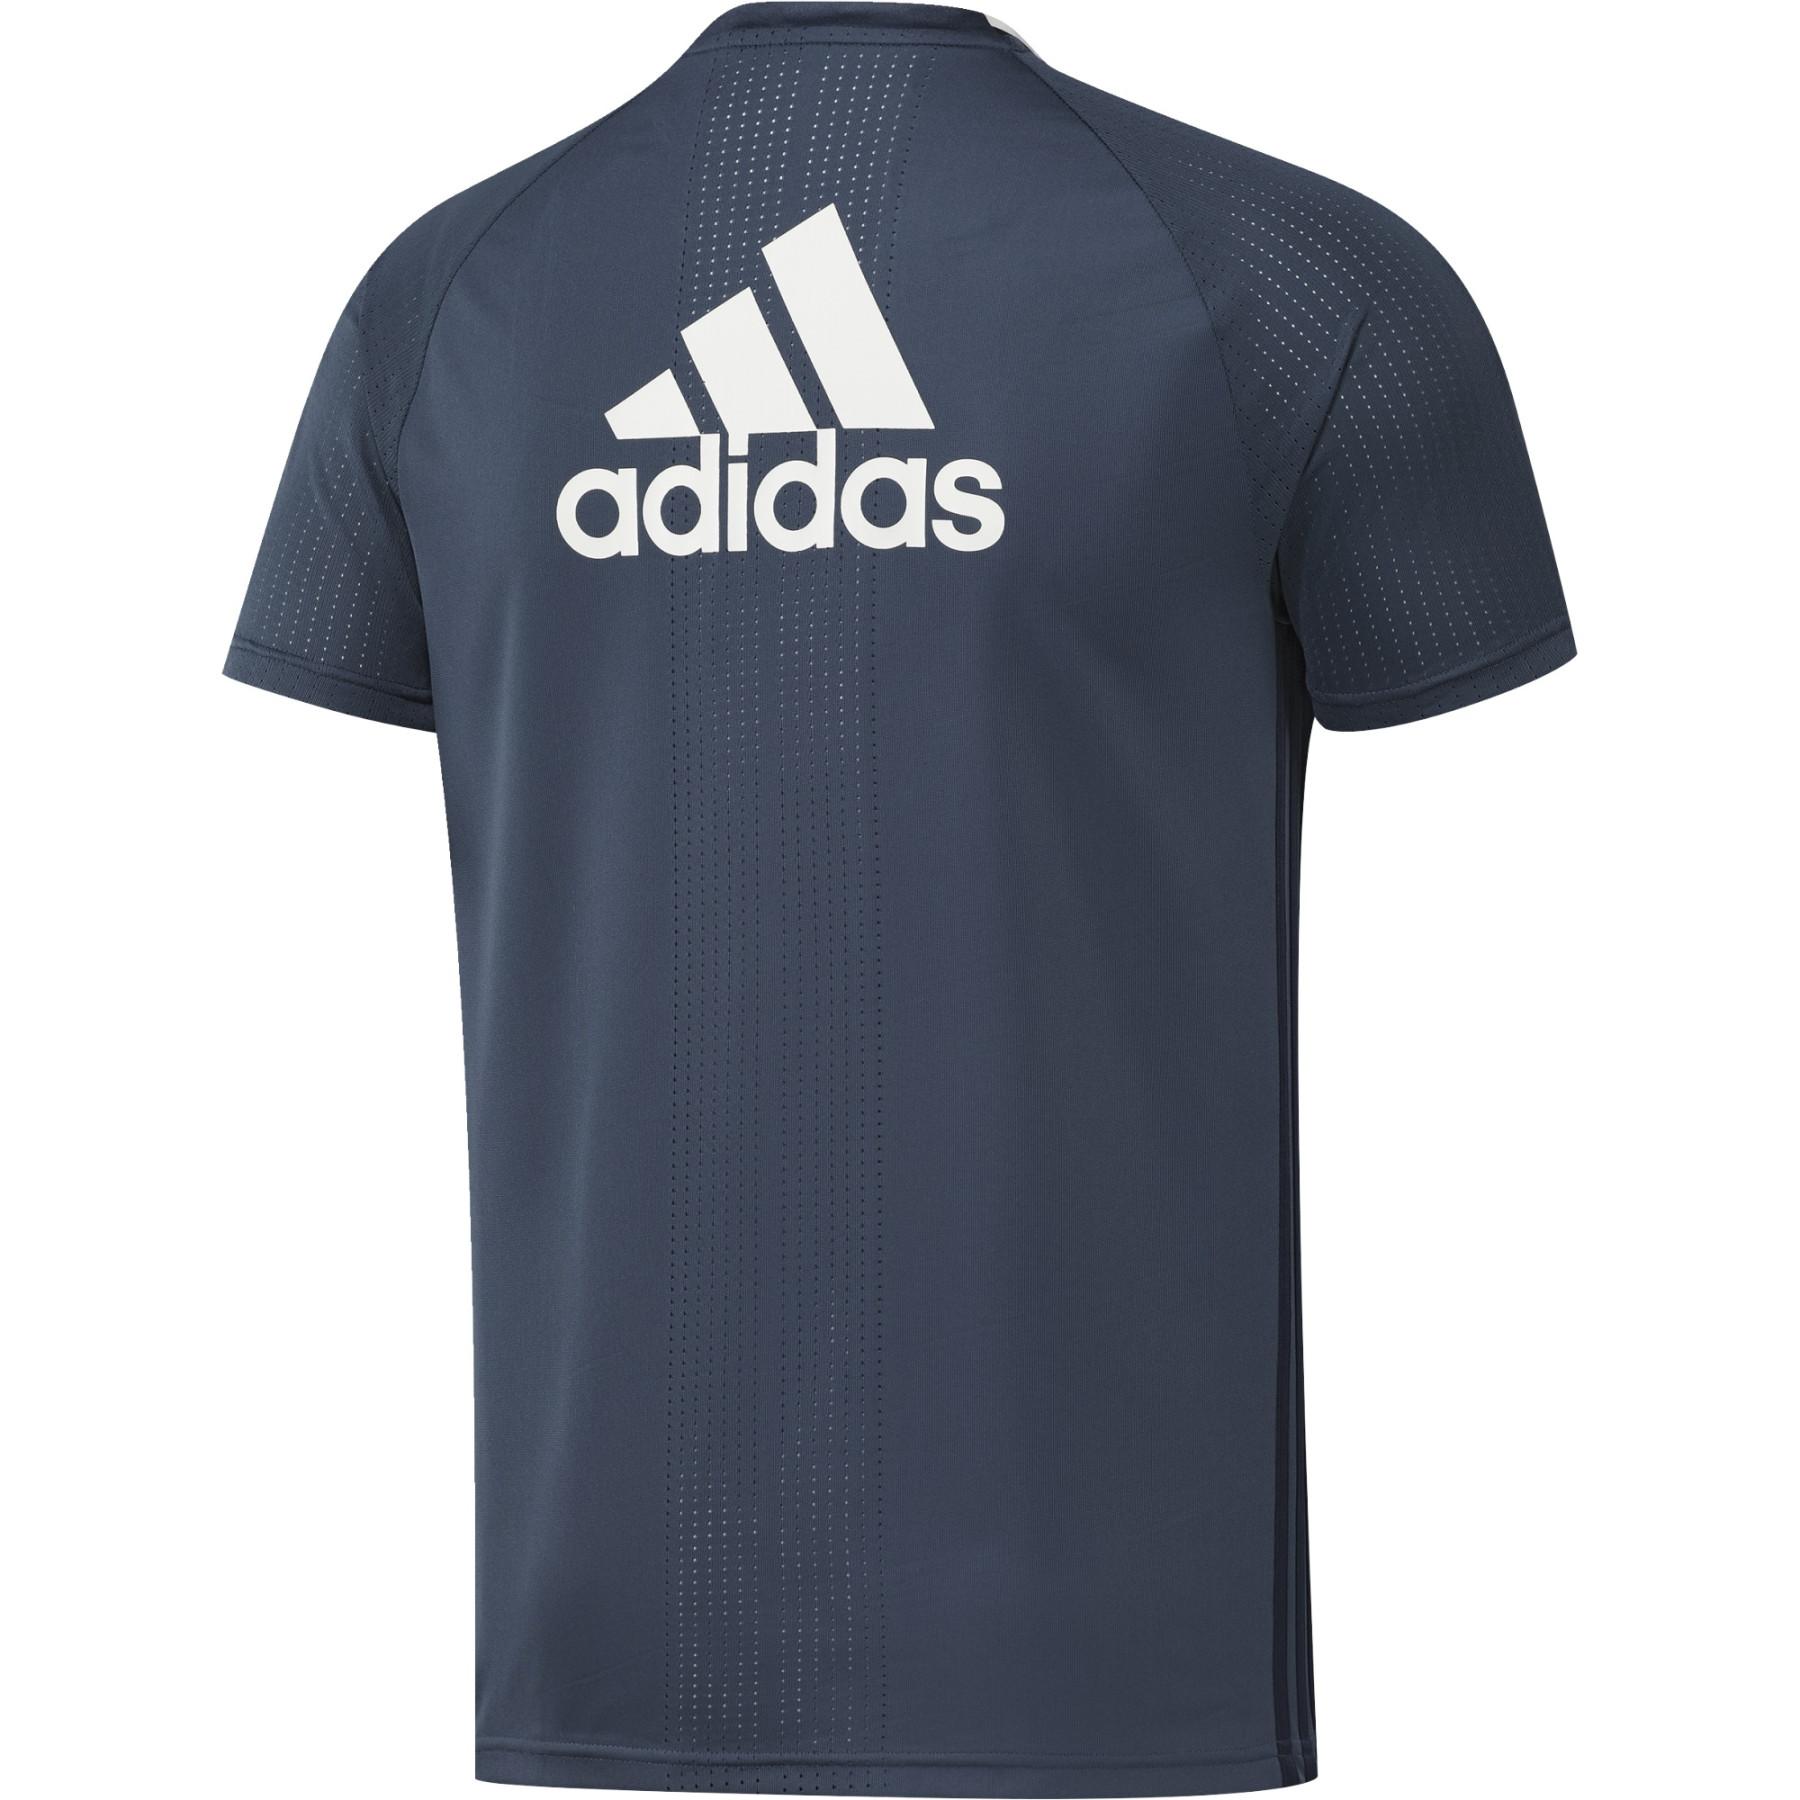 adidas manchester united maillot entrainement bleu 2016 2017 manchester united club etrangers. Black Bedroom Furniture Sets. Home Design Ideas